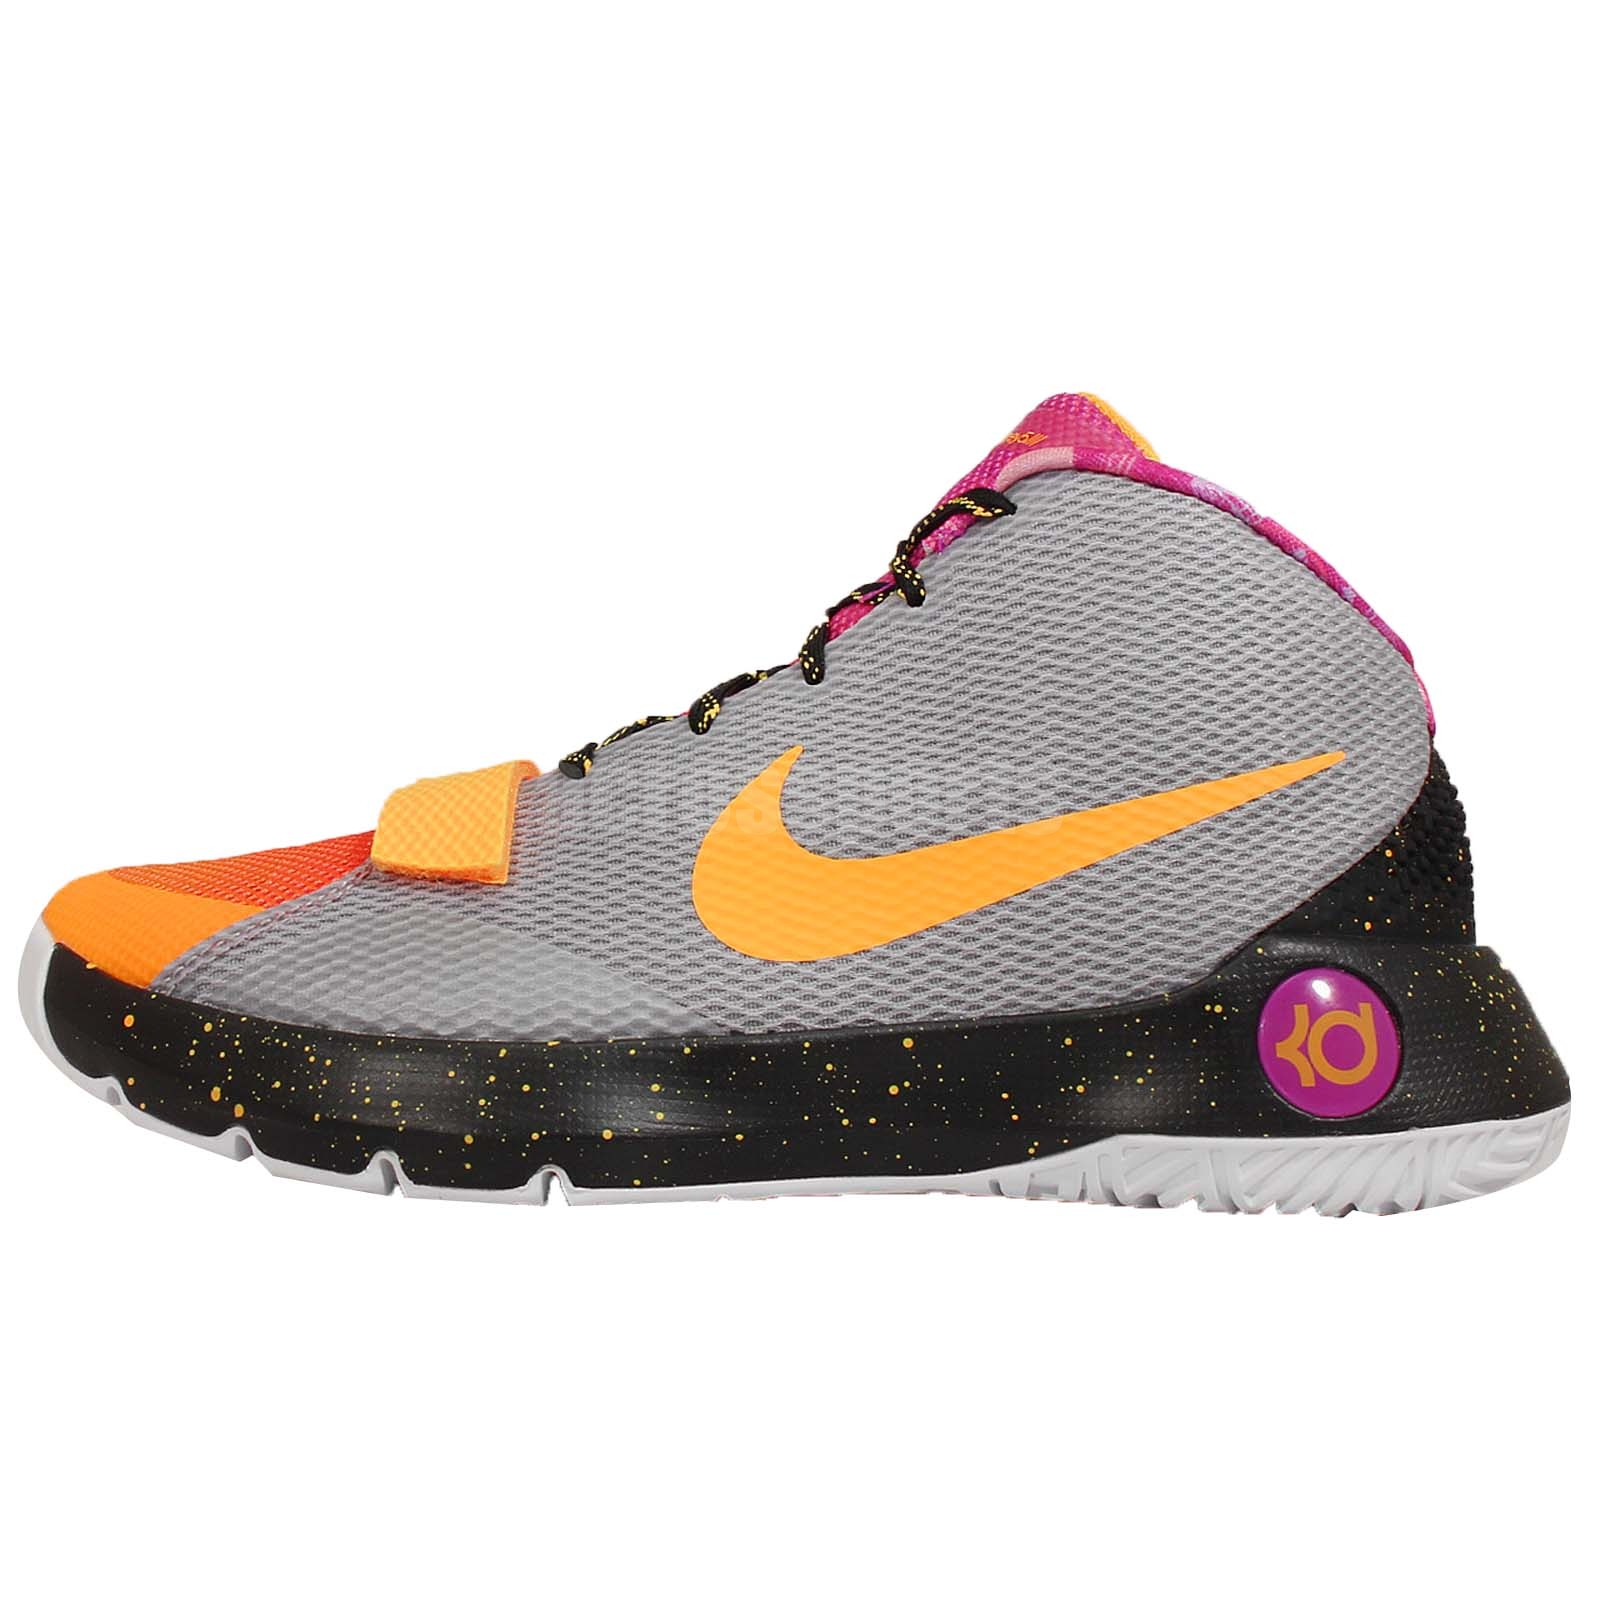 8aa212b1953b Nike KD TREY 5 III LMTD EP Kevin Durant Rise Mens Basketball Shoes  812570-090 .